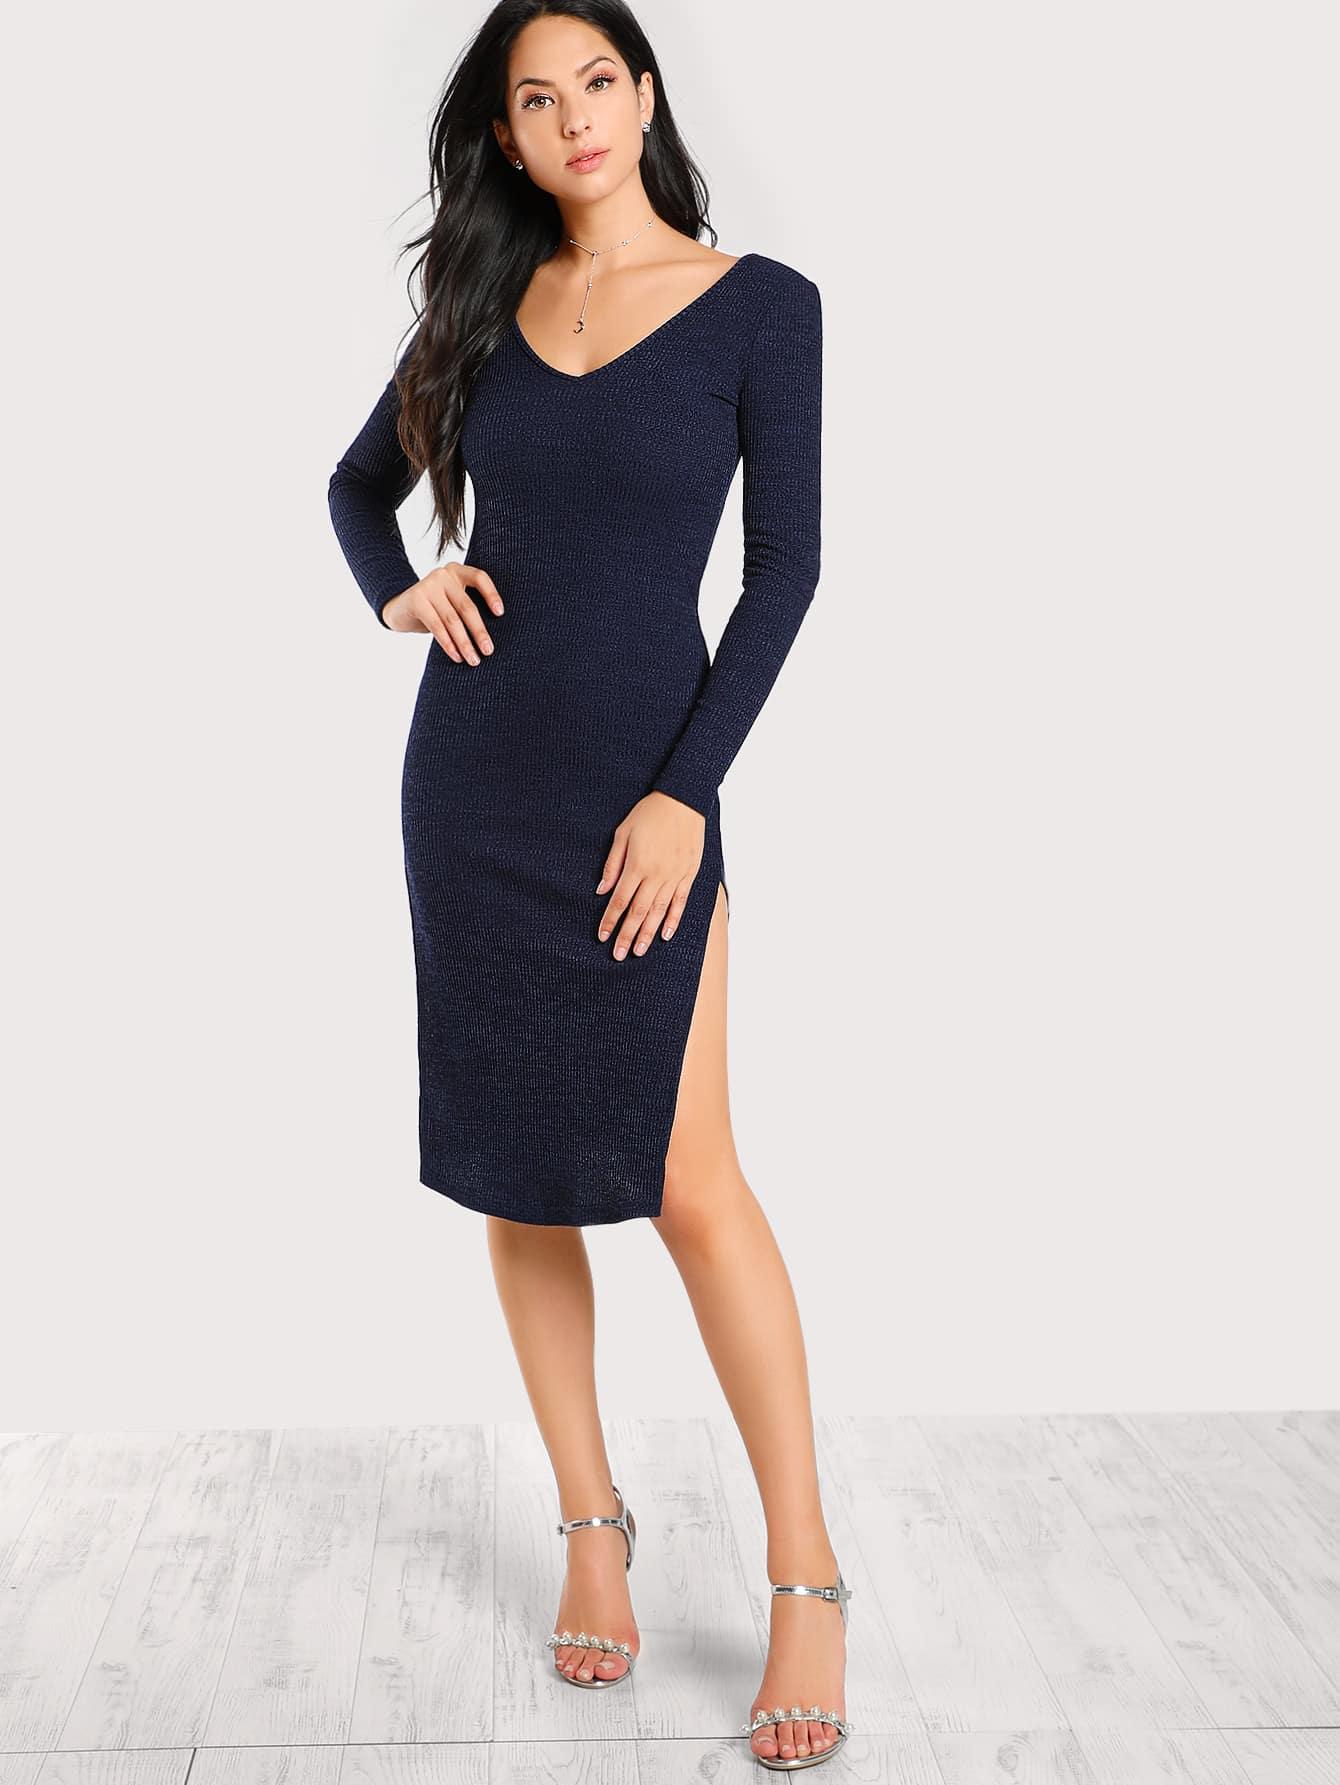 Double V Neck High Slit Rib Knit Dress dressmmc170829702